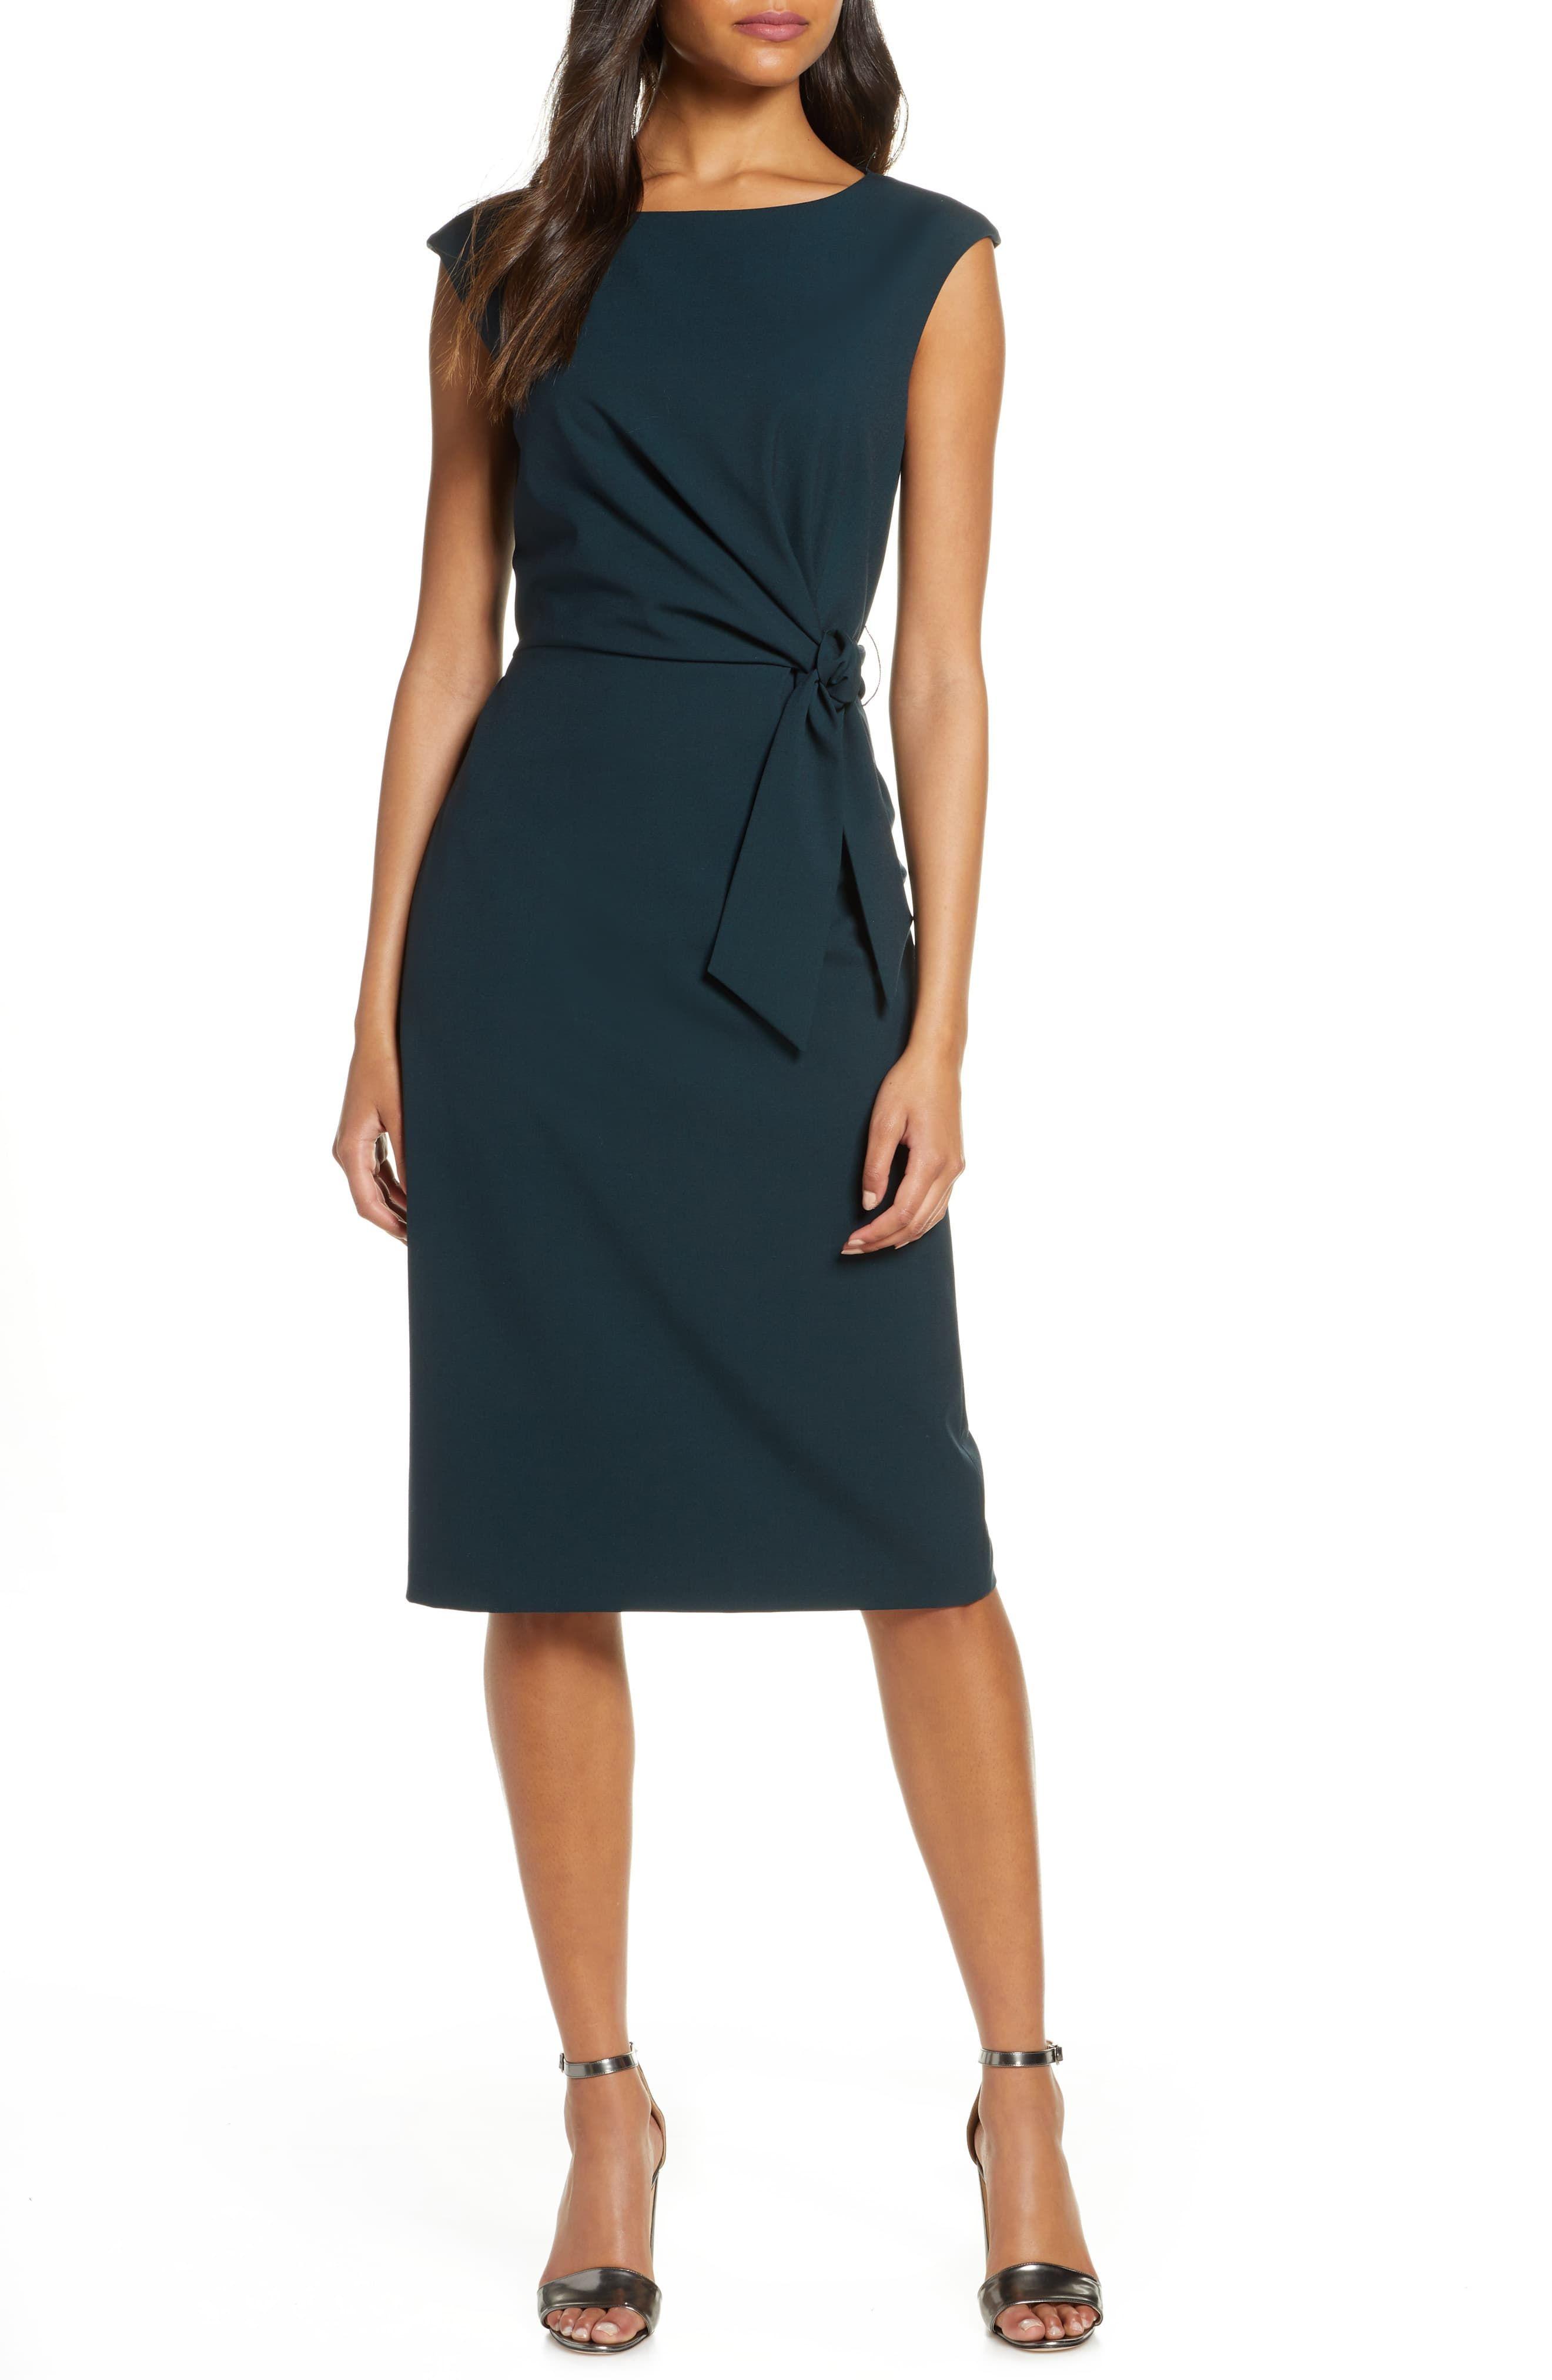 Tahari Cap Sleeve Crepe Sheath Dress Nordstrom In 2020 Sheath Dresses Work Nordstrom Dresses Dresses